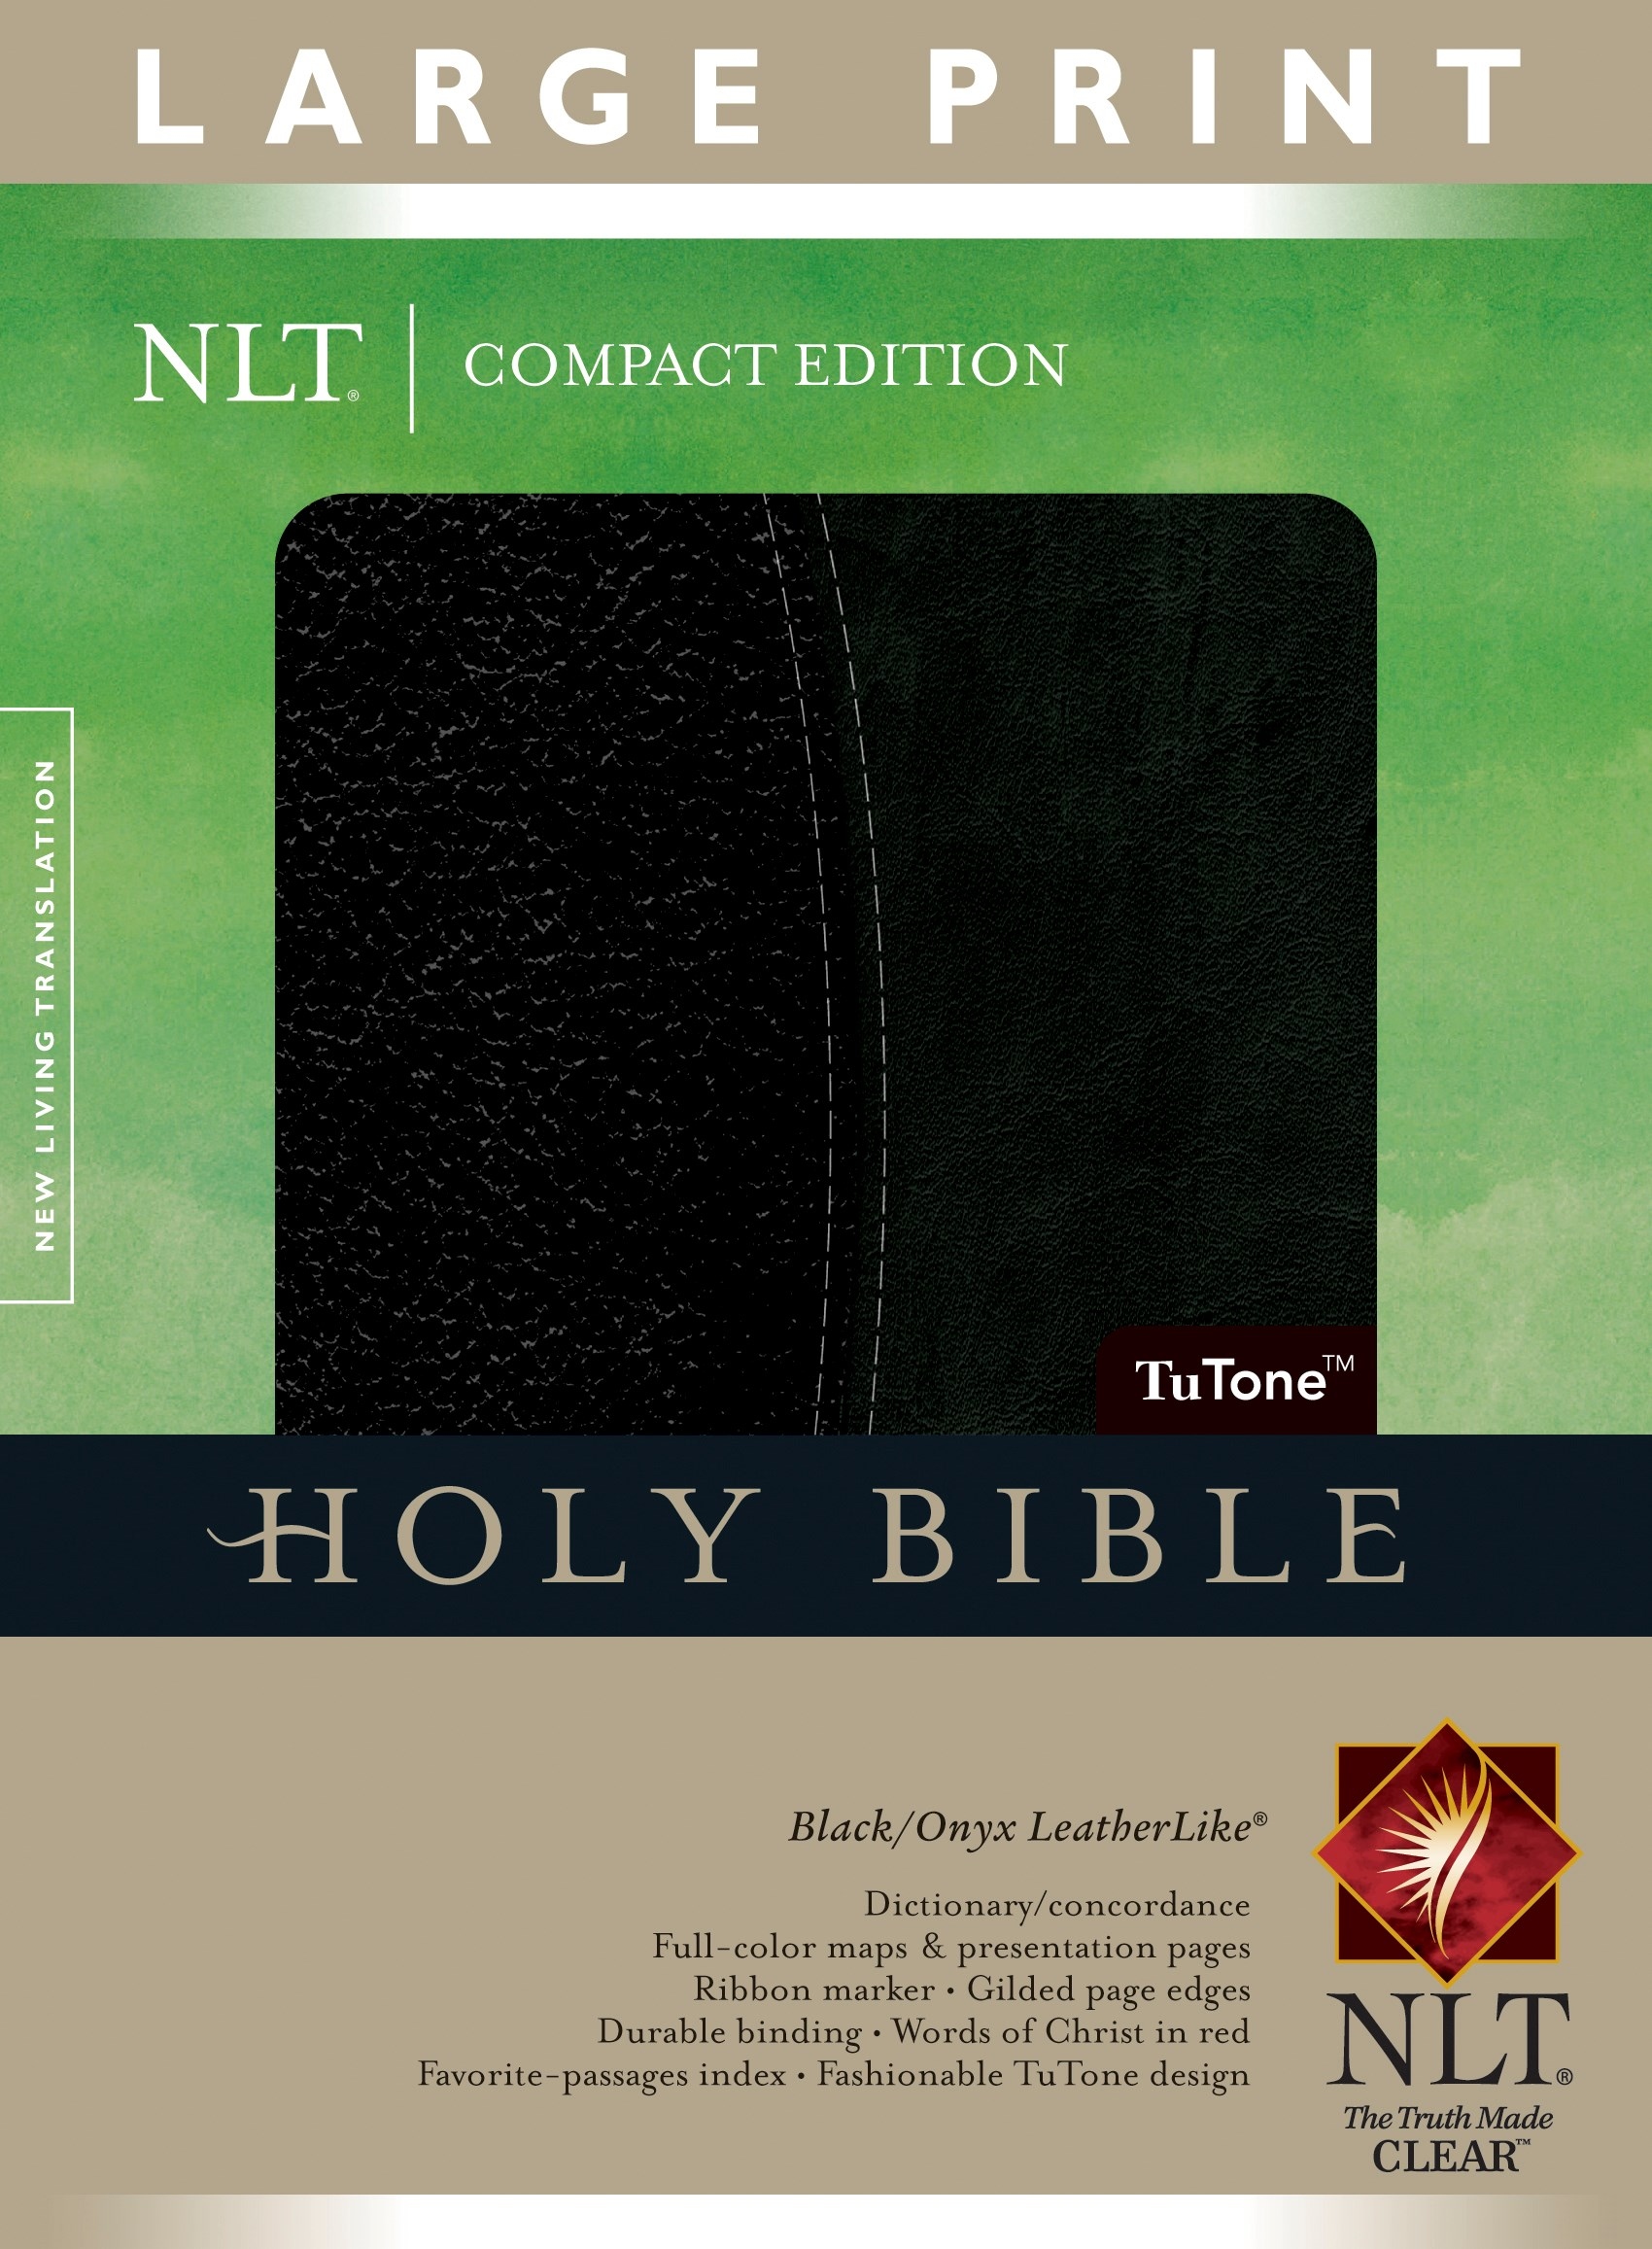 NLT Compact Edition Bible/Large Print-Black/Onyx TuTone